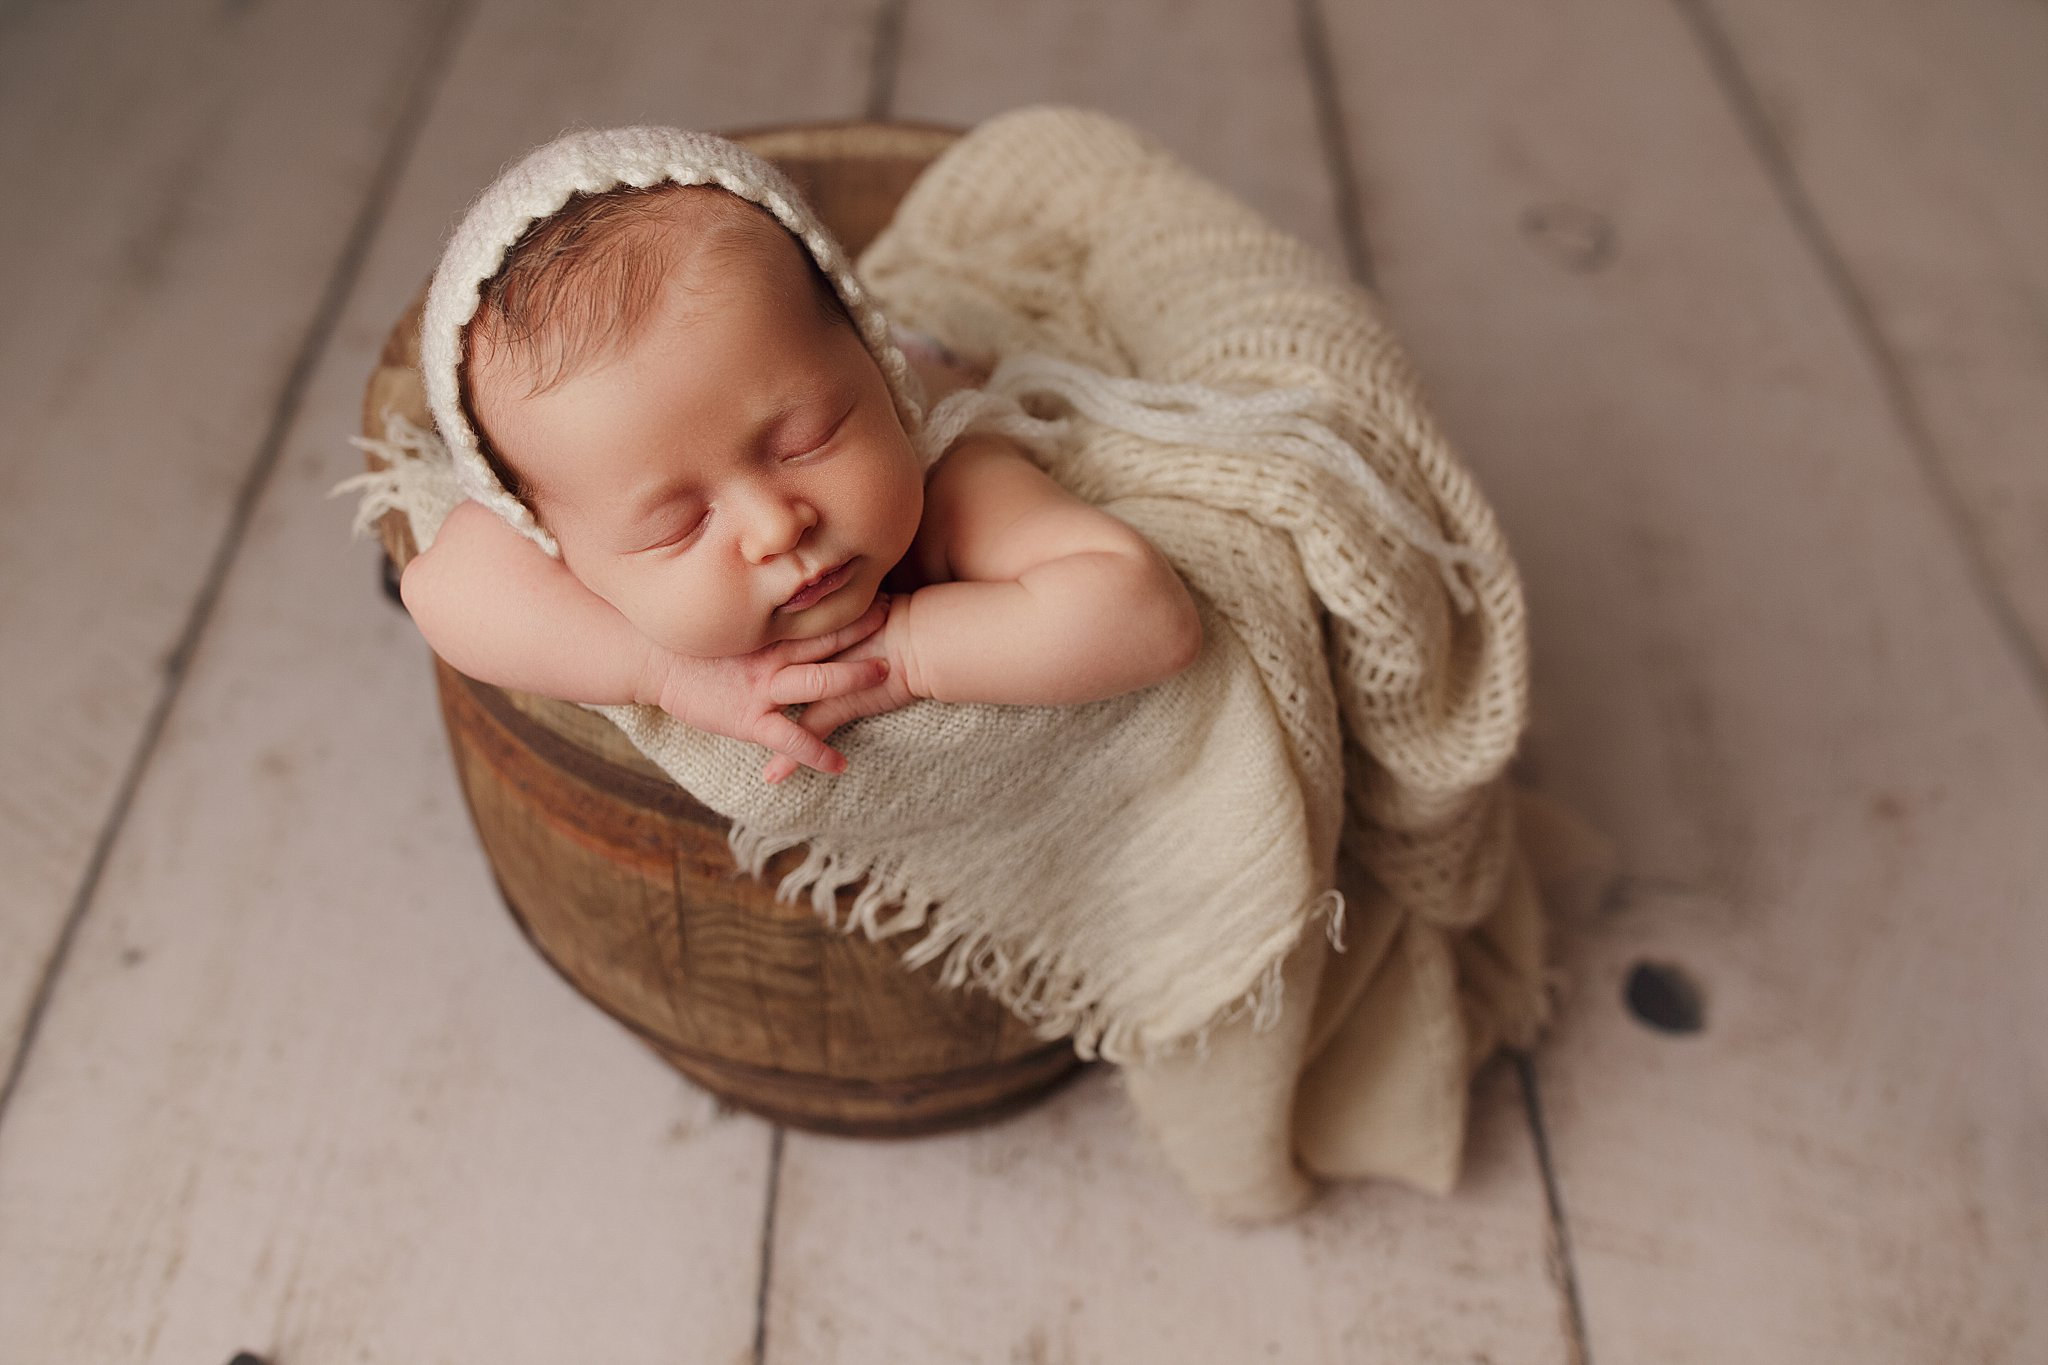 newborn photography houston tx